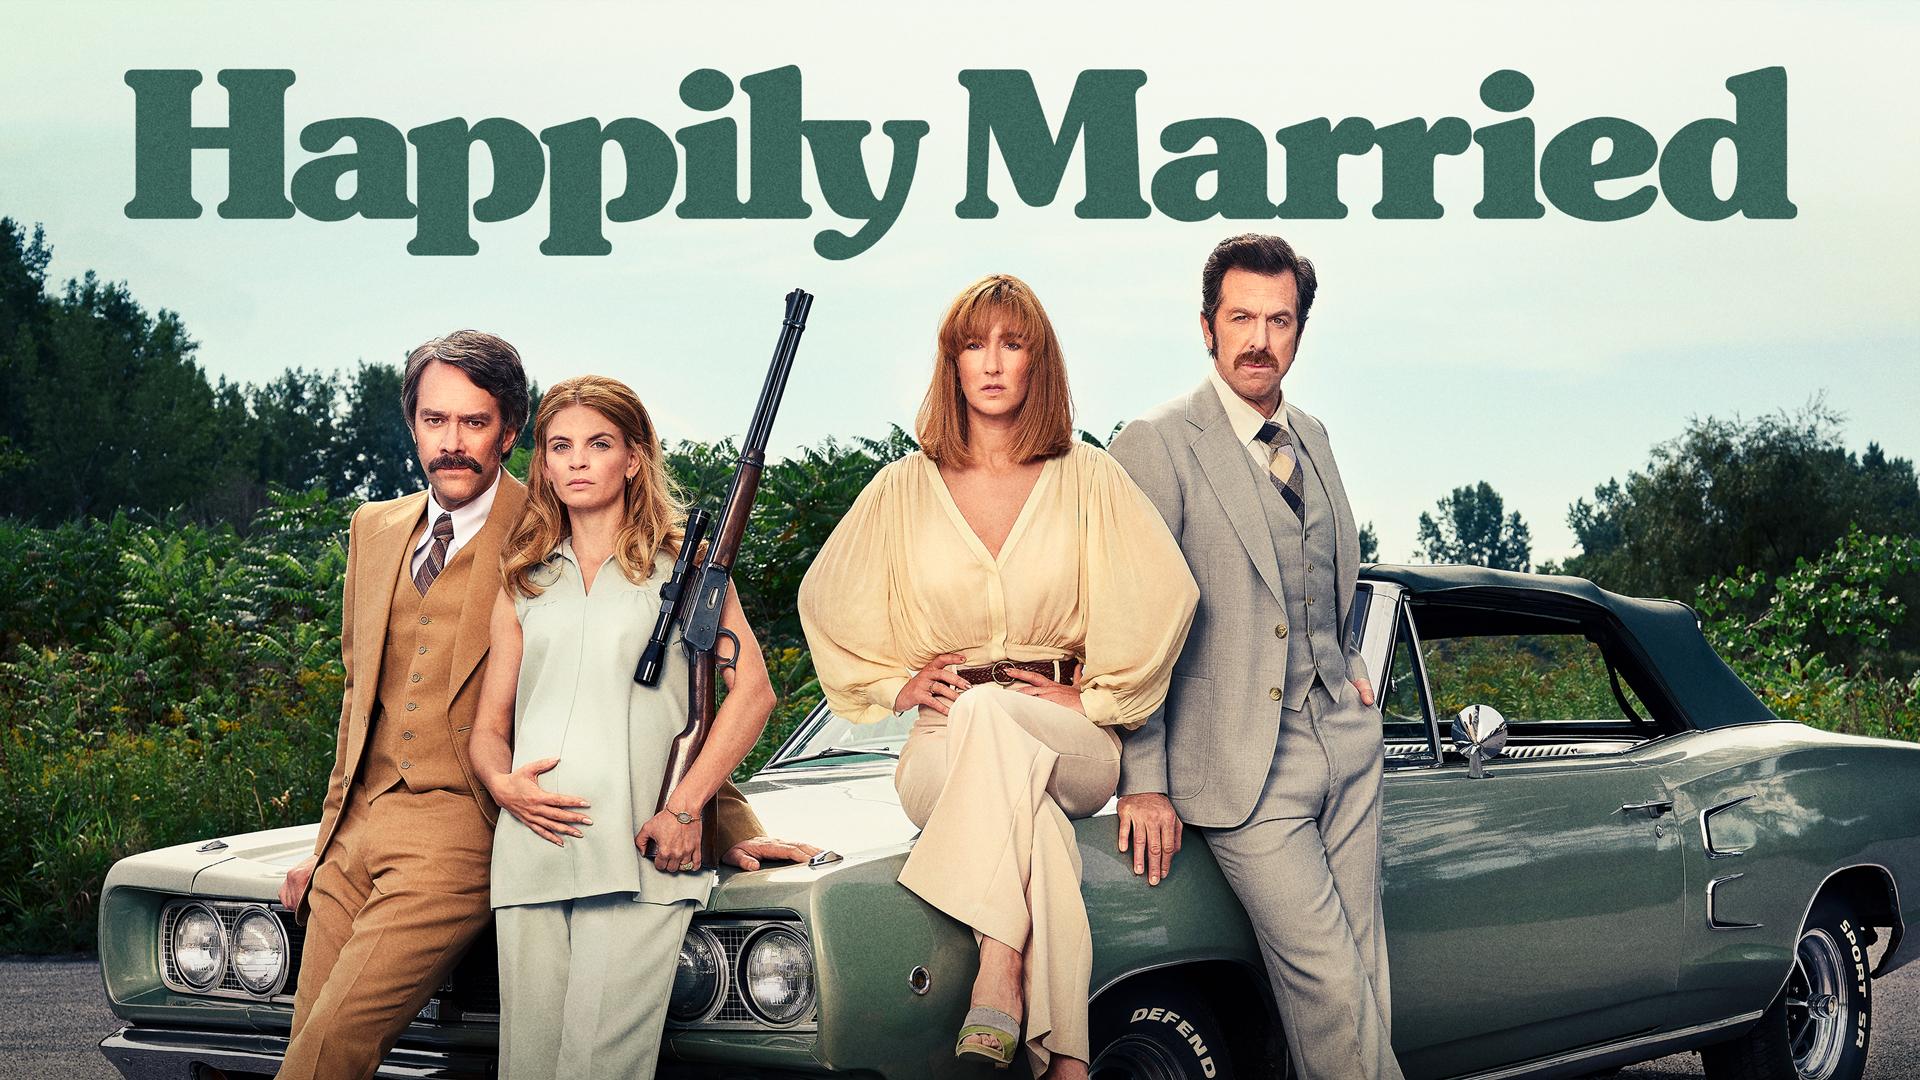 Happily Married Season 1